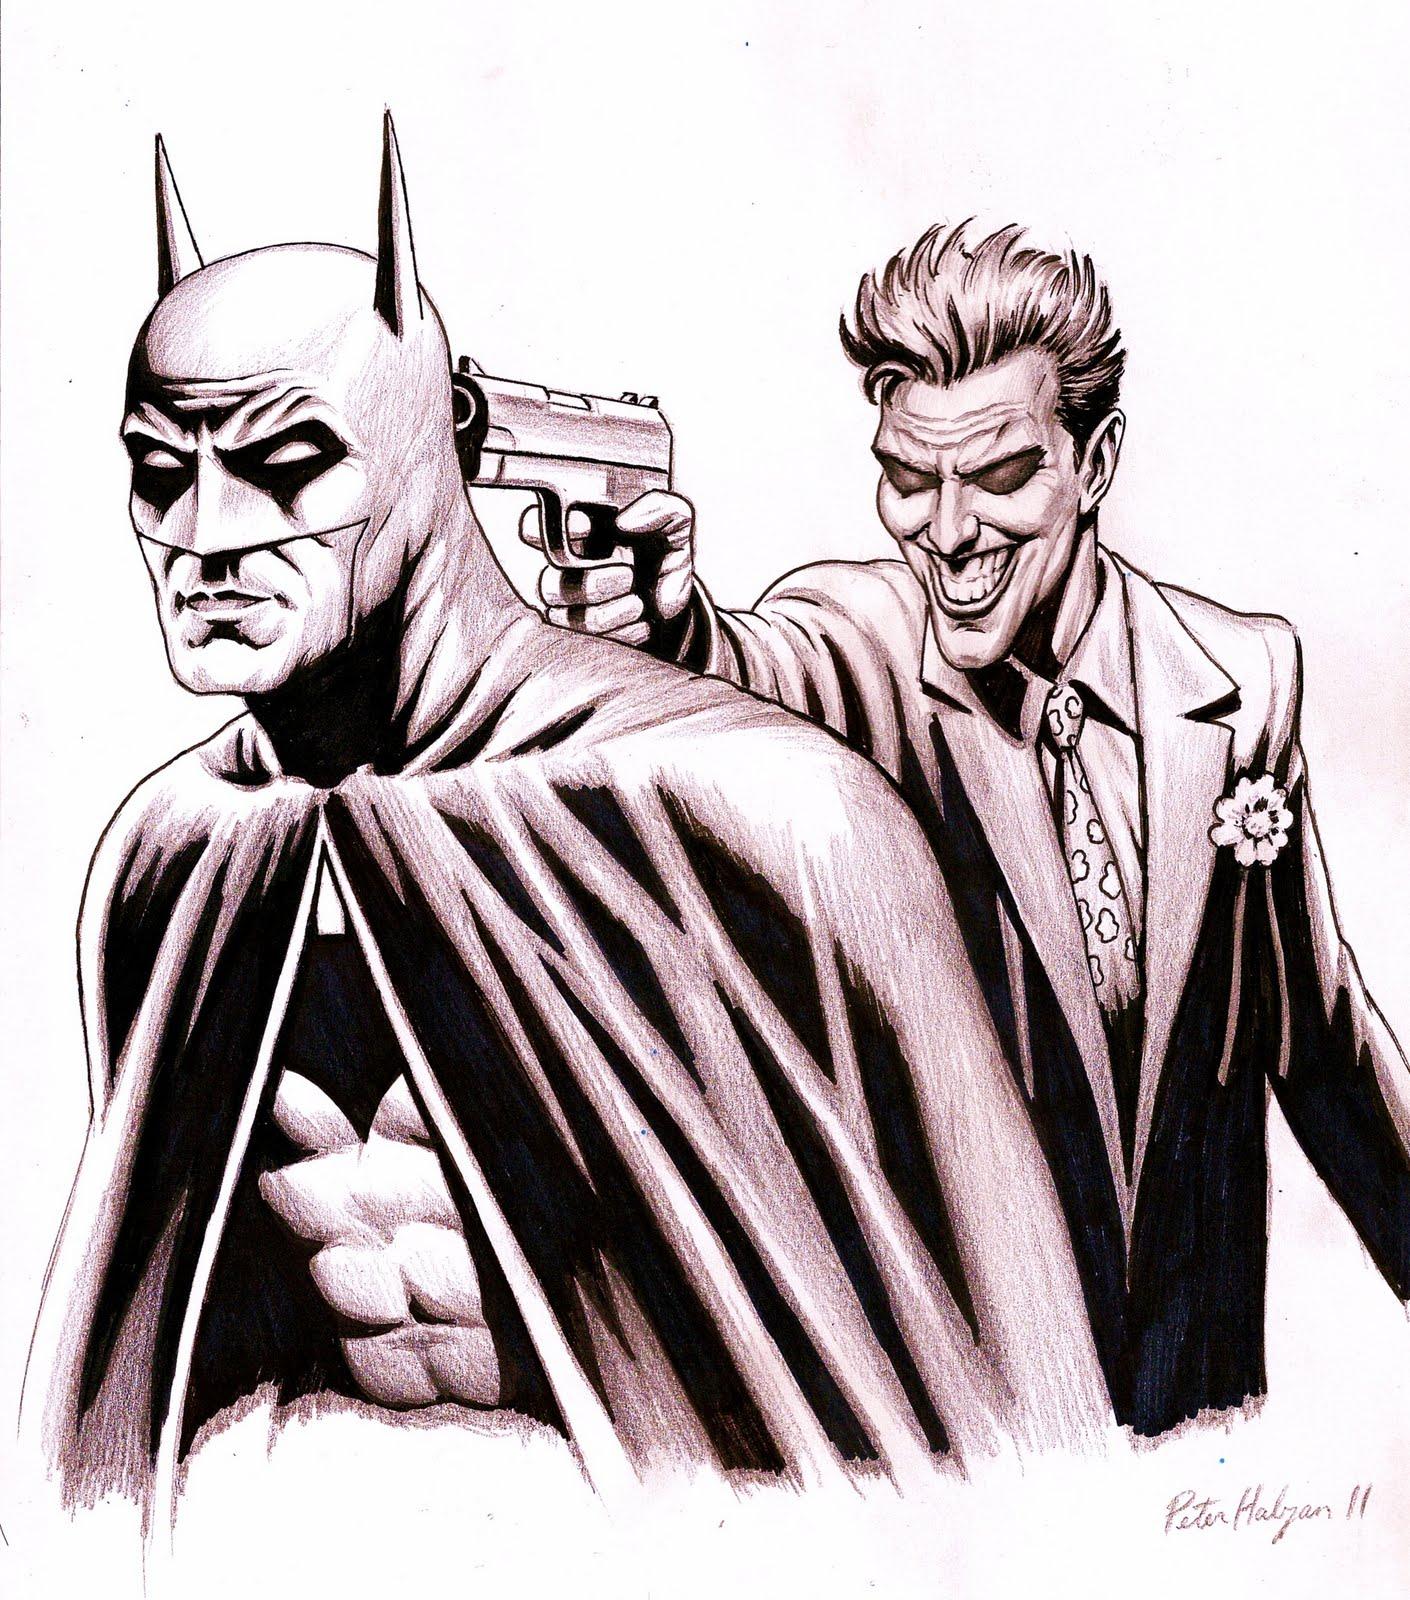 1410x1600 Peter Habjan Art Batman And The Joker